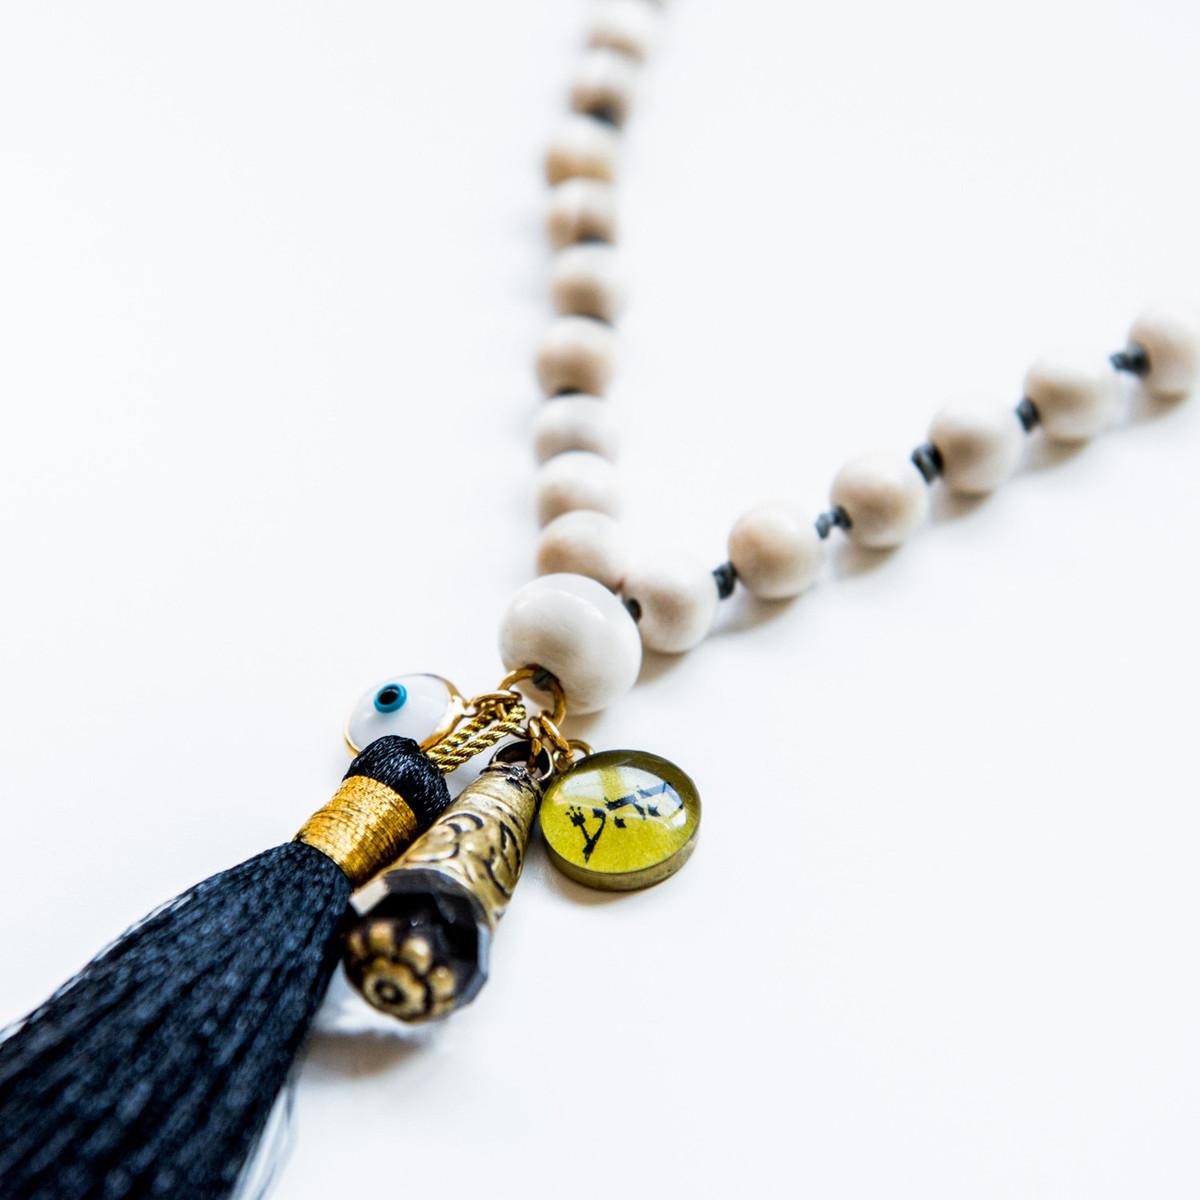 7Stitches White Wood Kabbalah Necklace with Long Black silk tassel